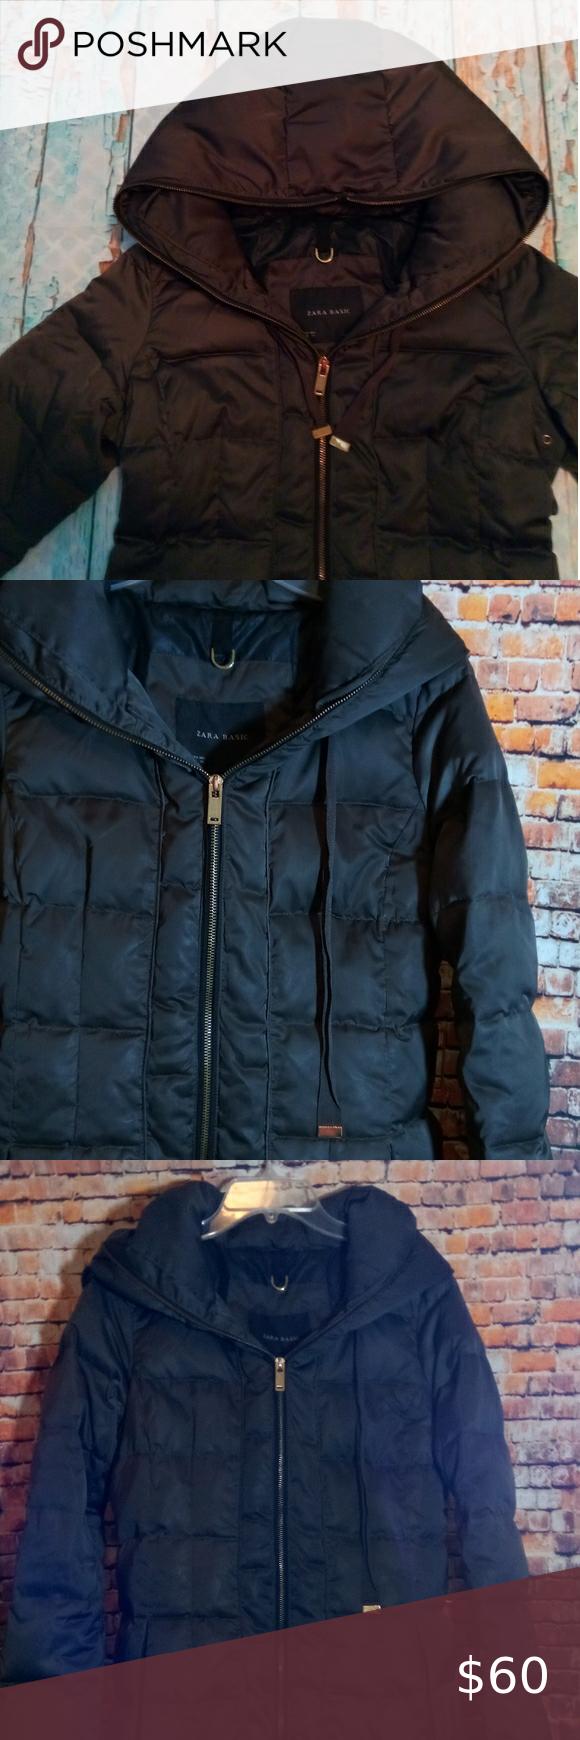 Zara Basic Coat Hooded Zara Basic Zara Hooded Coat [ 1740 x 580 Pixel ]